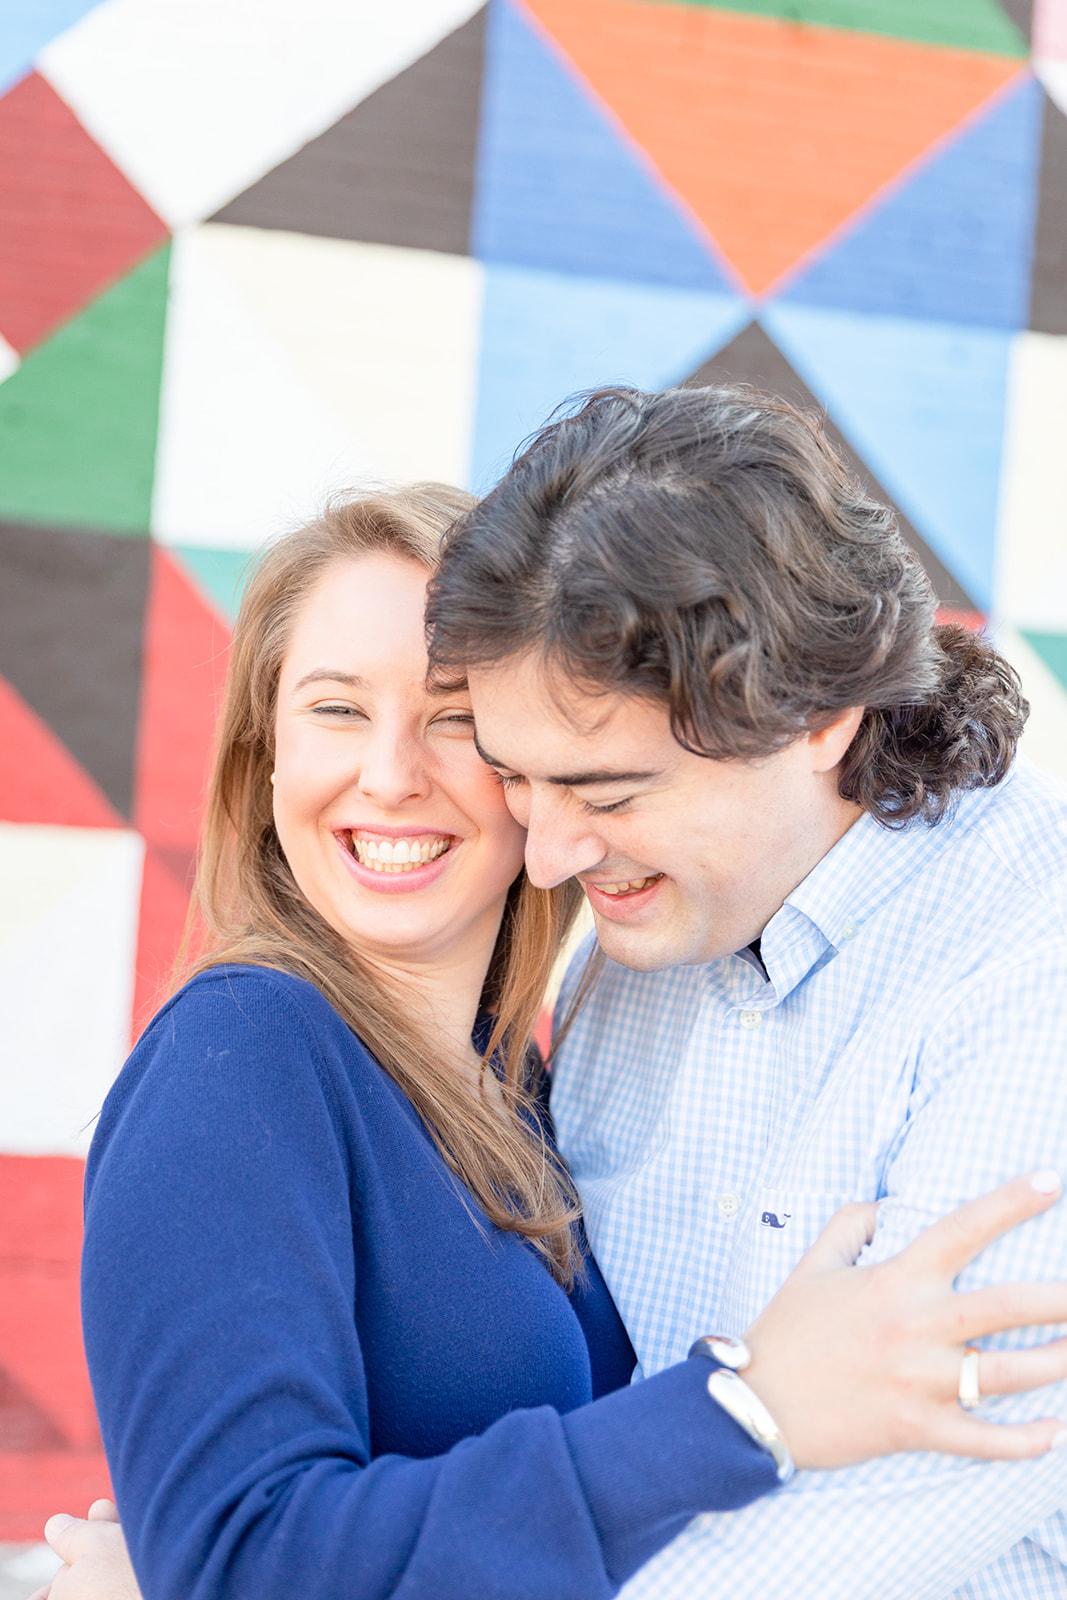 Sam + Meredith Engagement